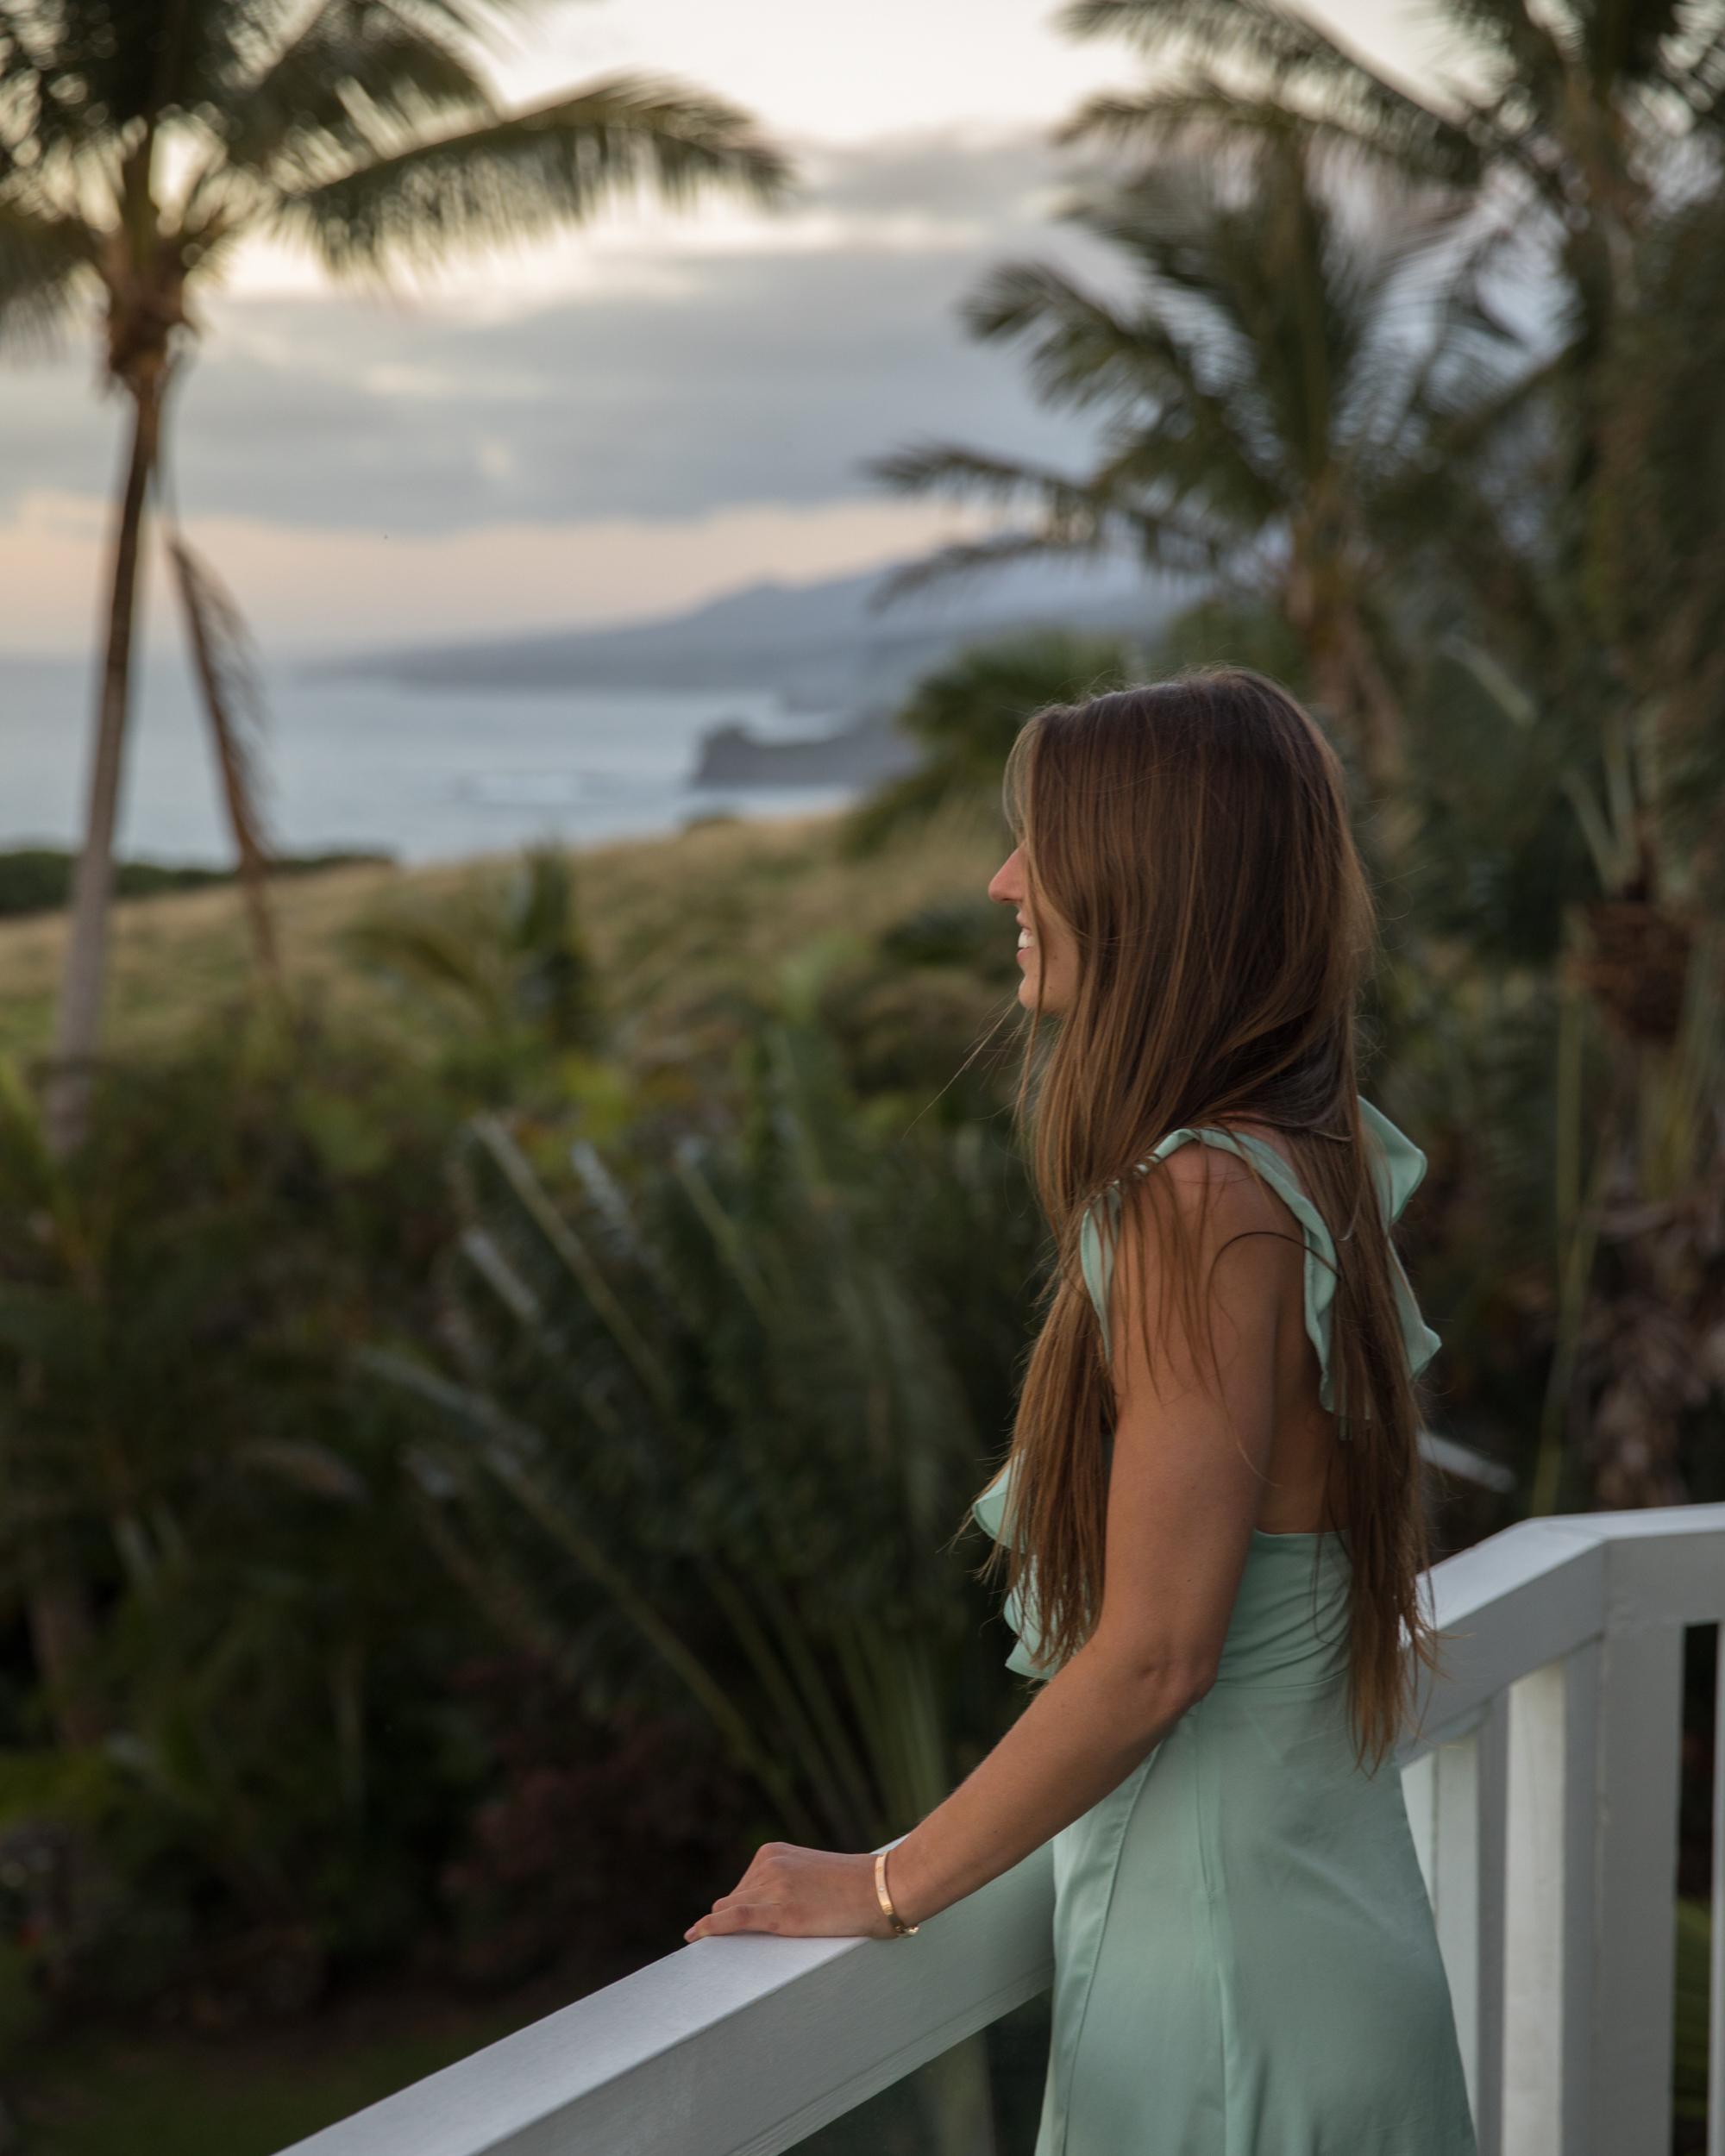 2018_02_06 Maui with Andrea-2161.jpg